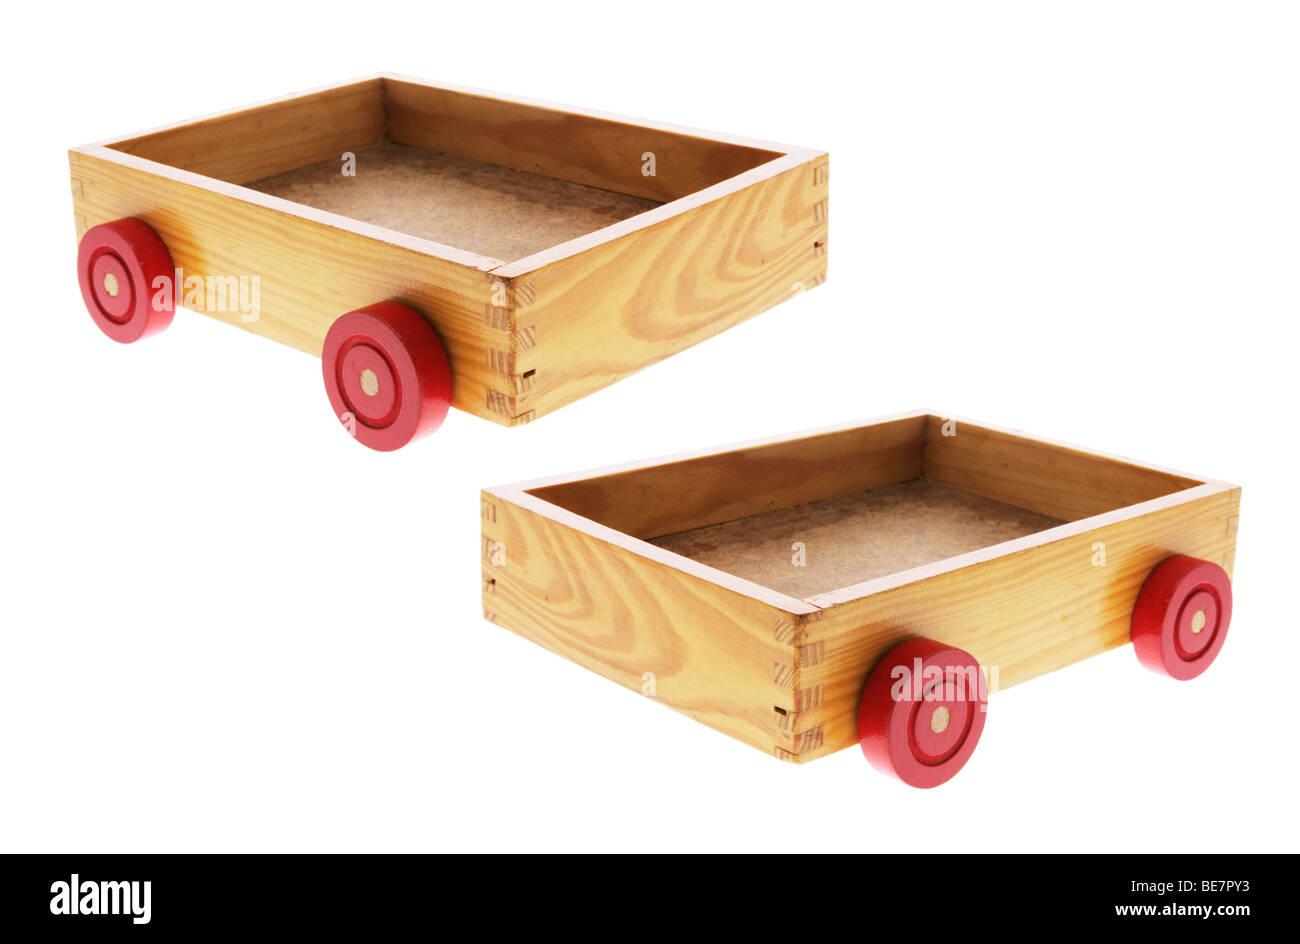 Wooden Wagon Wheels Stock Photos & Wooden Wagon Wheels Stock Images ...